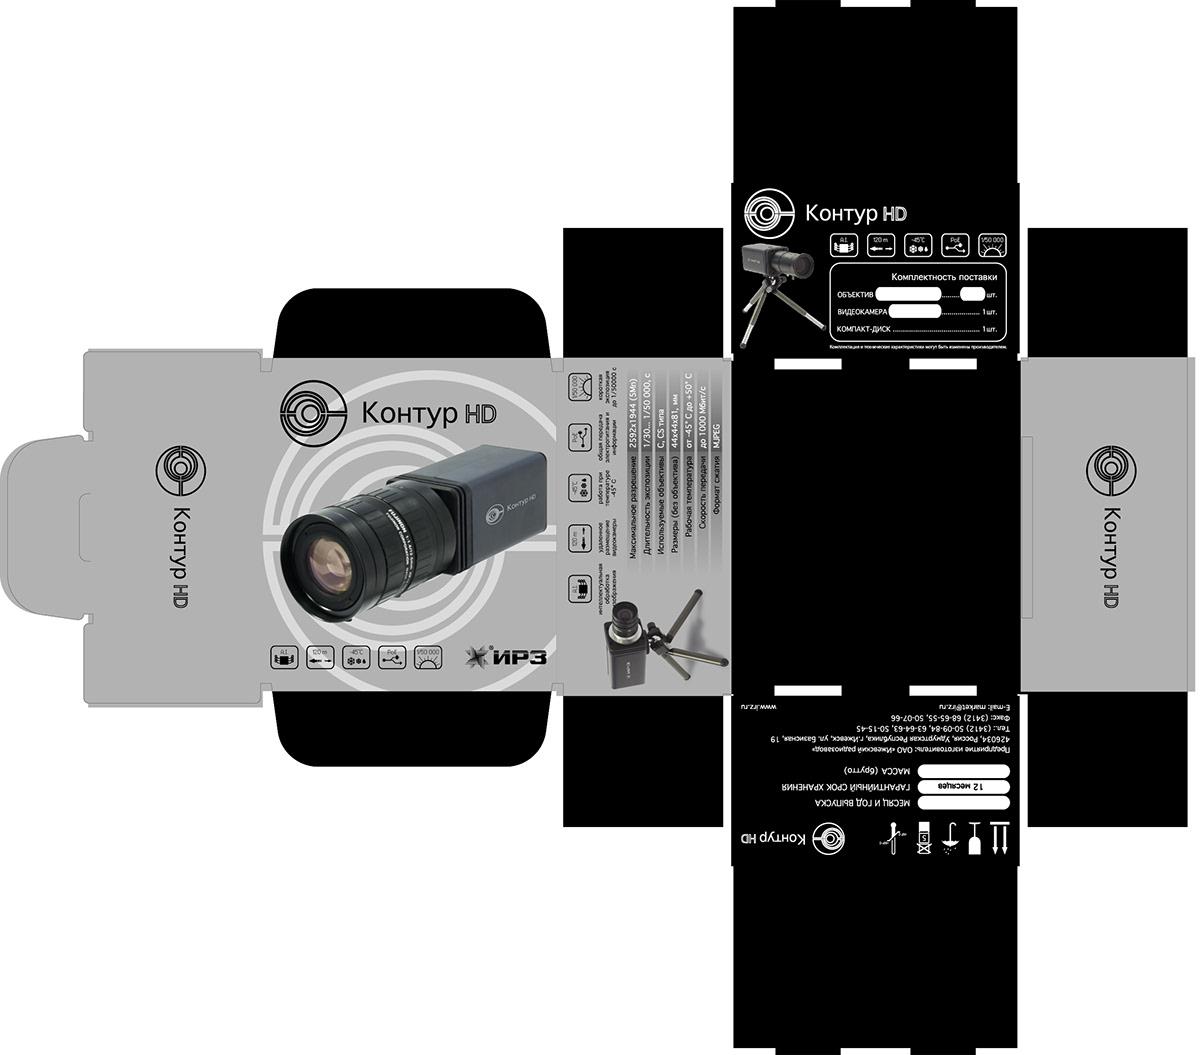 kontur HD camera industrial